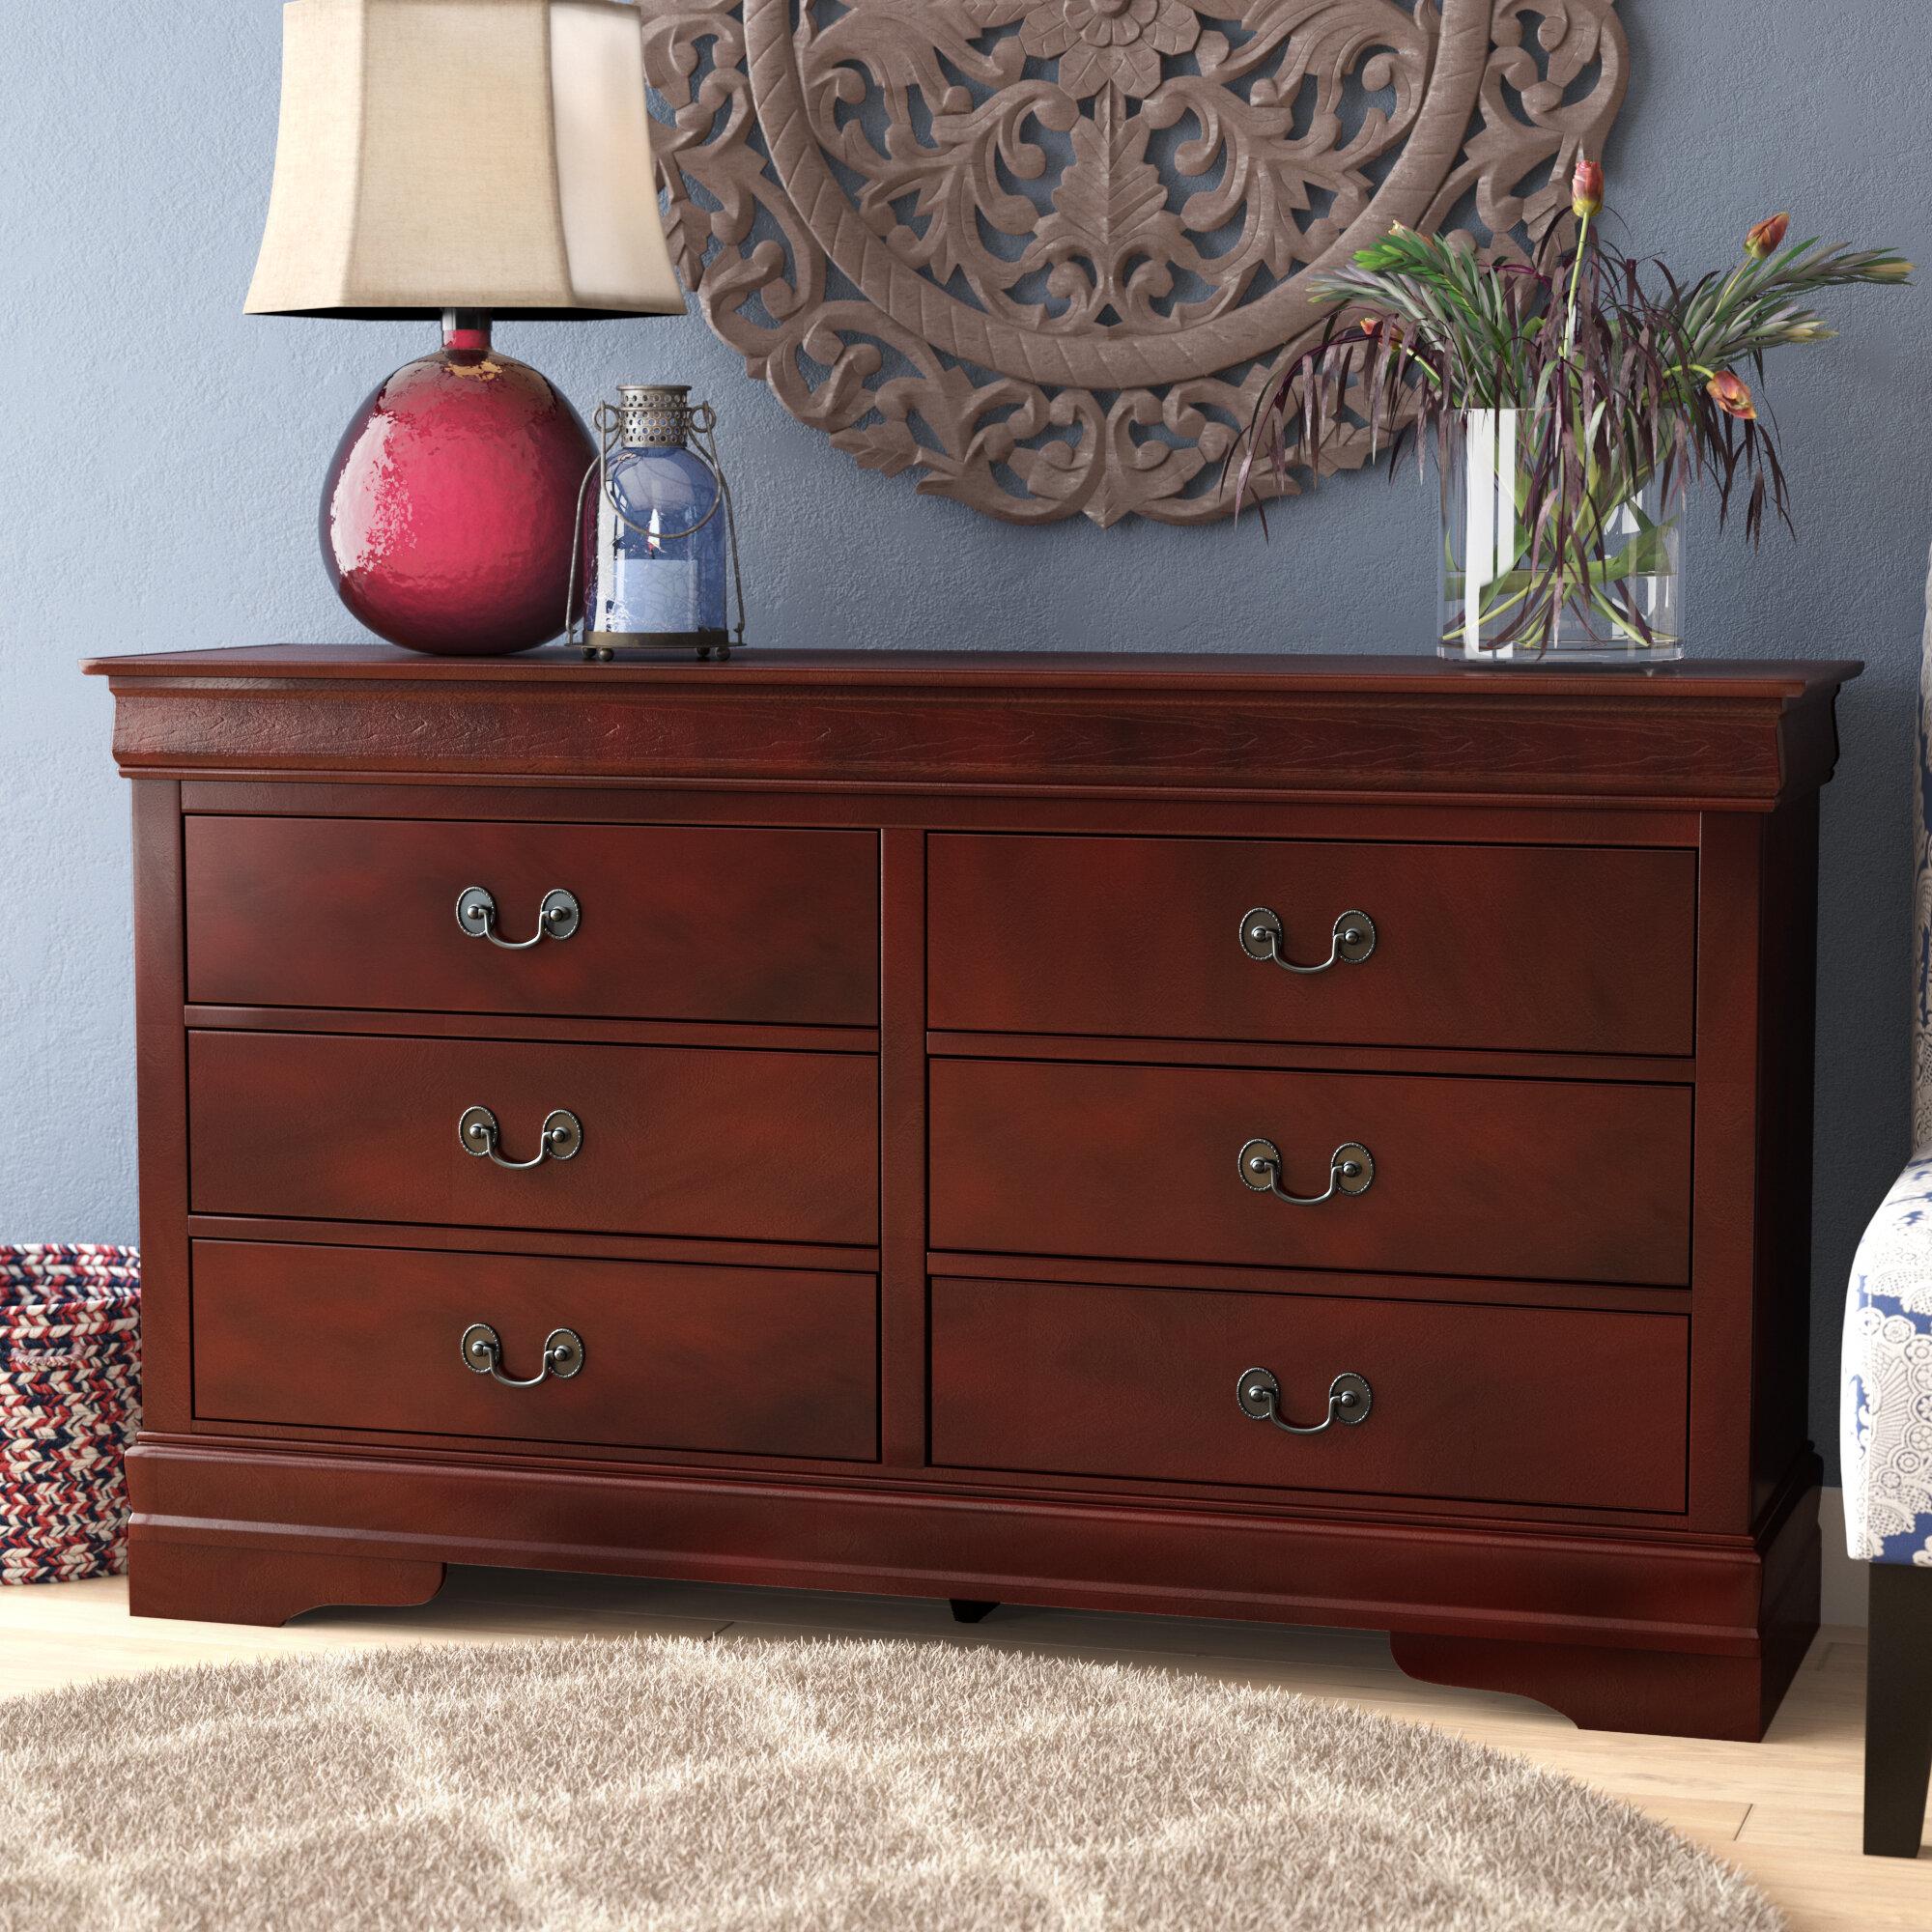 Darby Home Co Oldbury 6 Drawer Double Dresser Reviews Wayfair